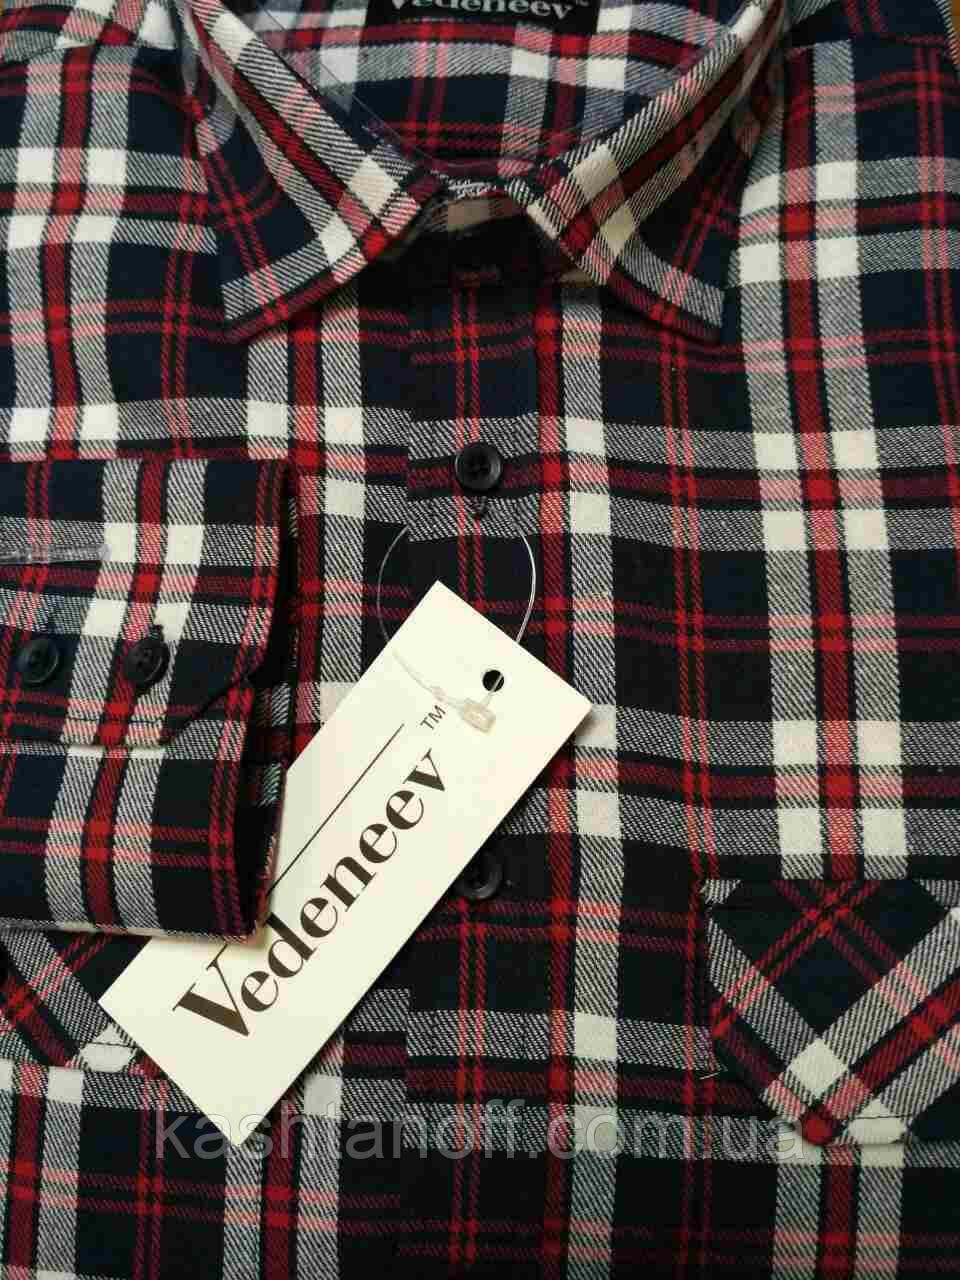 897aa45f1ed Сине-красная фланелевая рубашка в клетку с двумя карманами -  Интернет-магазин КАШТАН Мужская